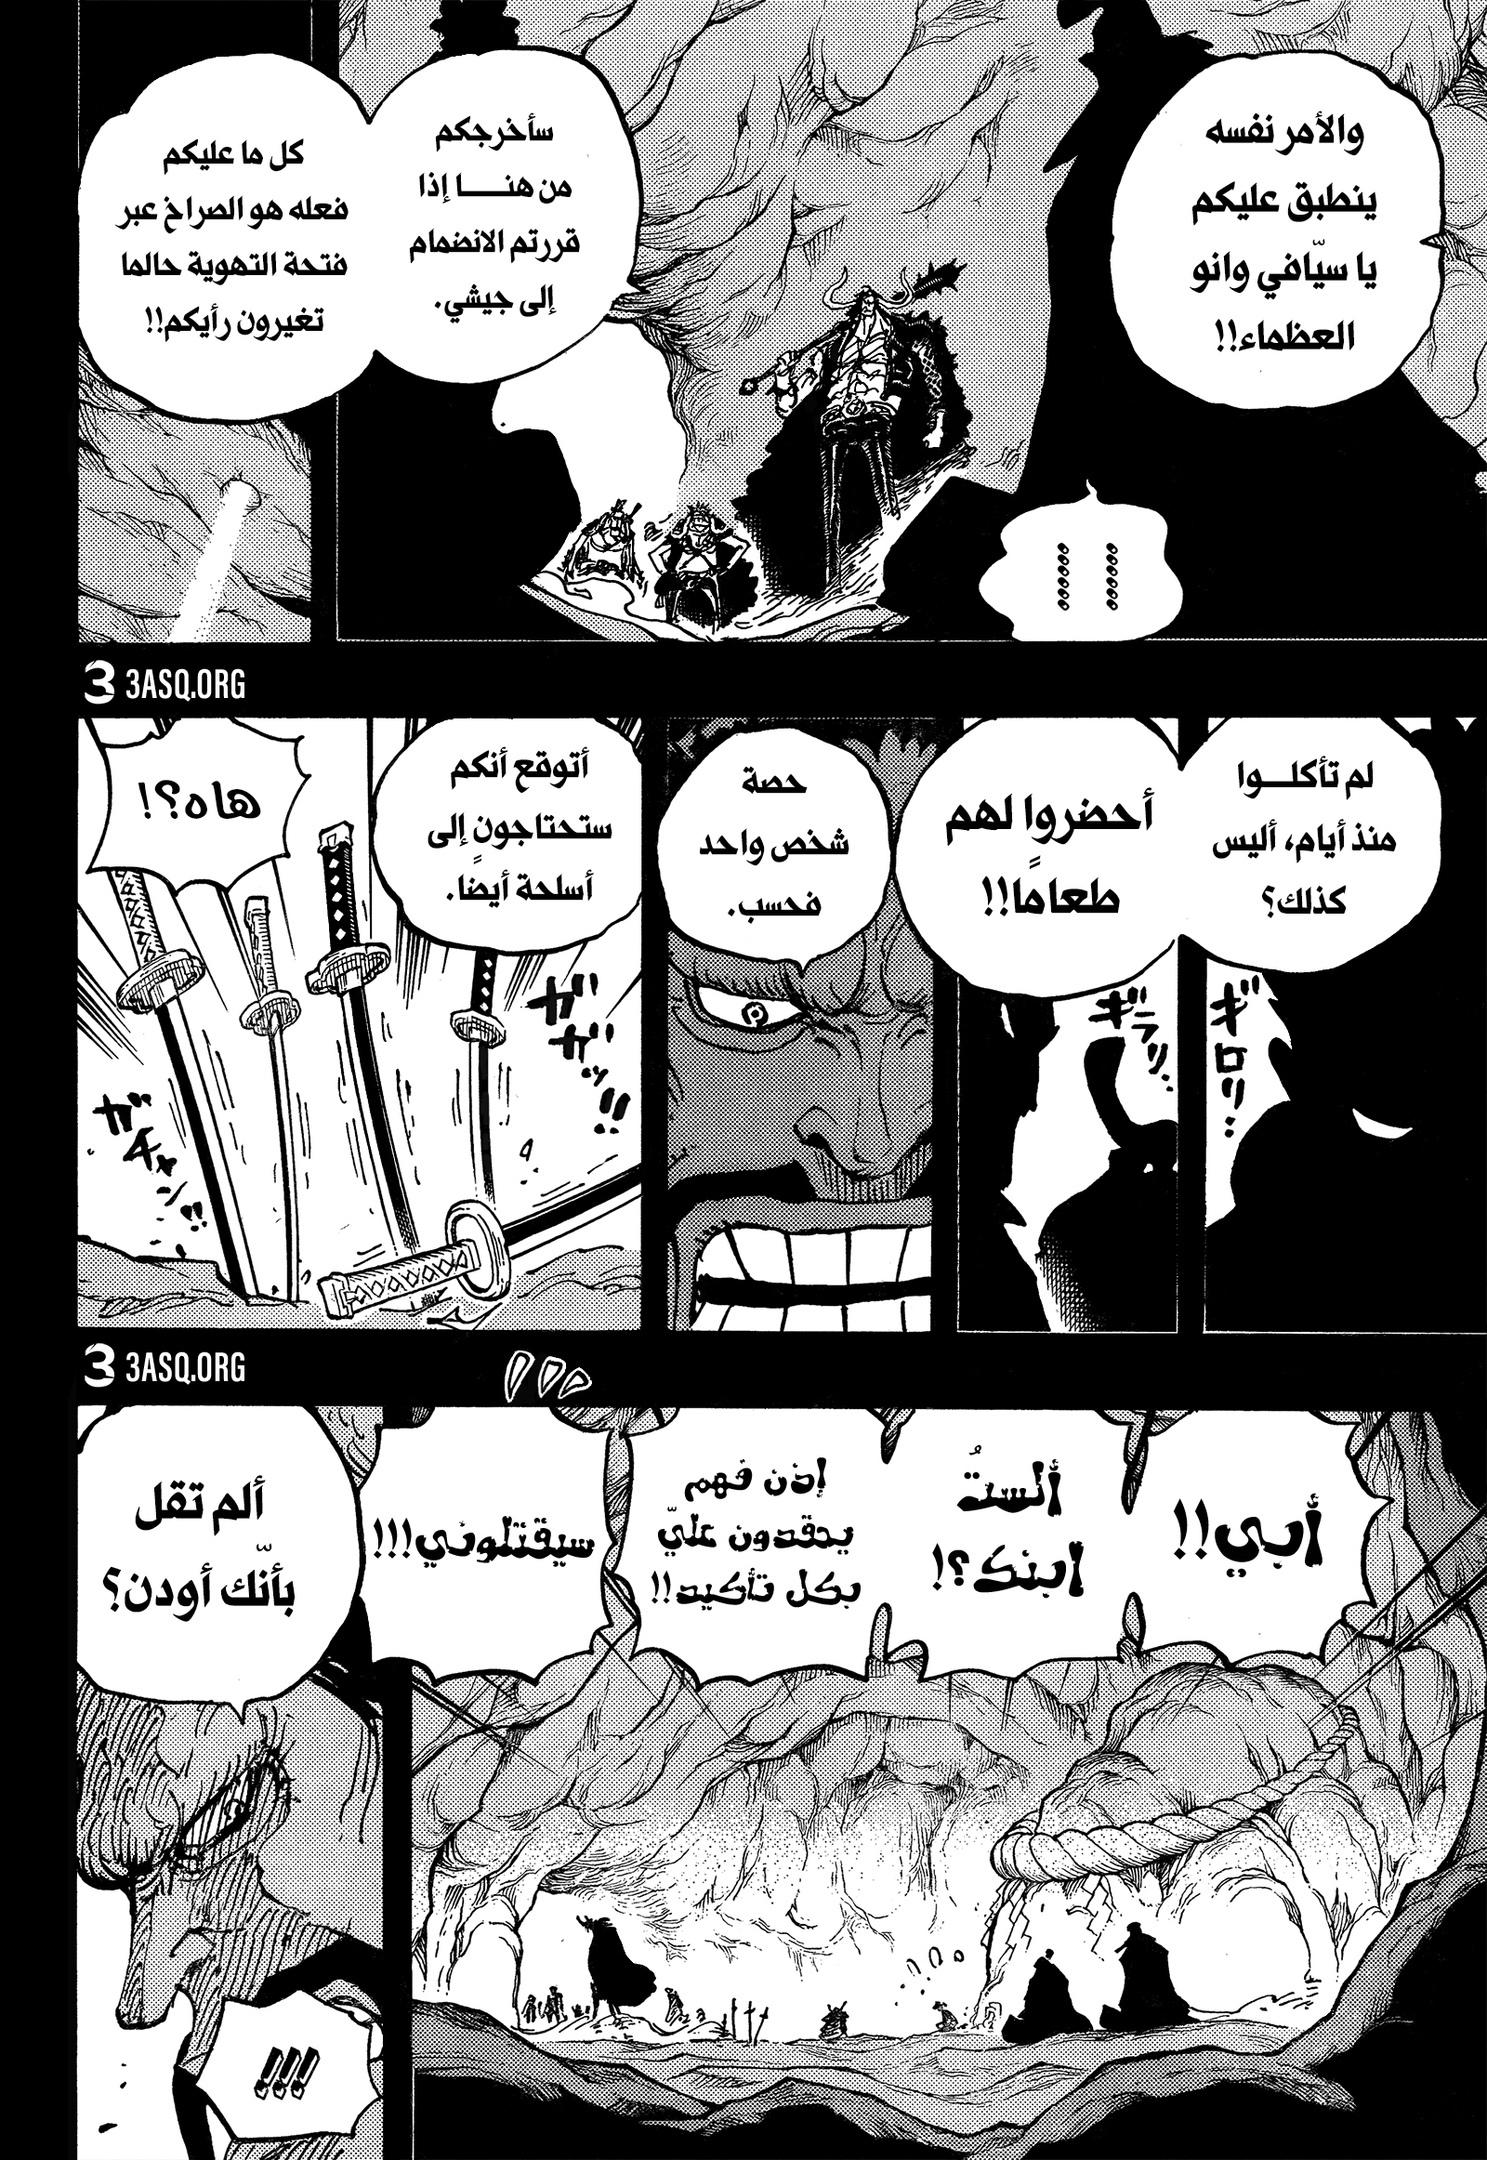 One Piece Arab 1024, image №12